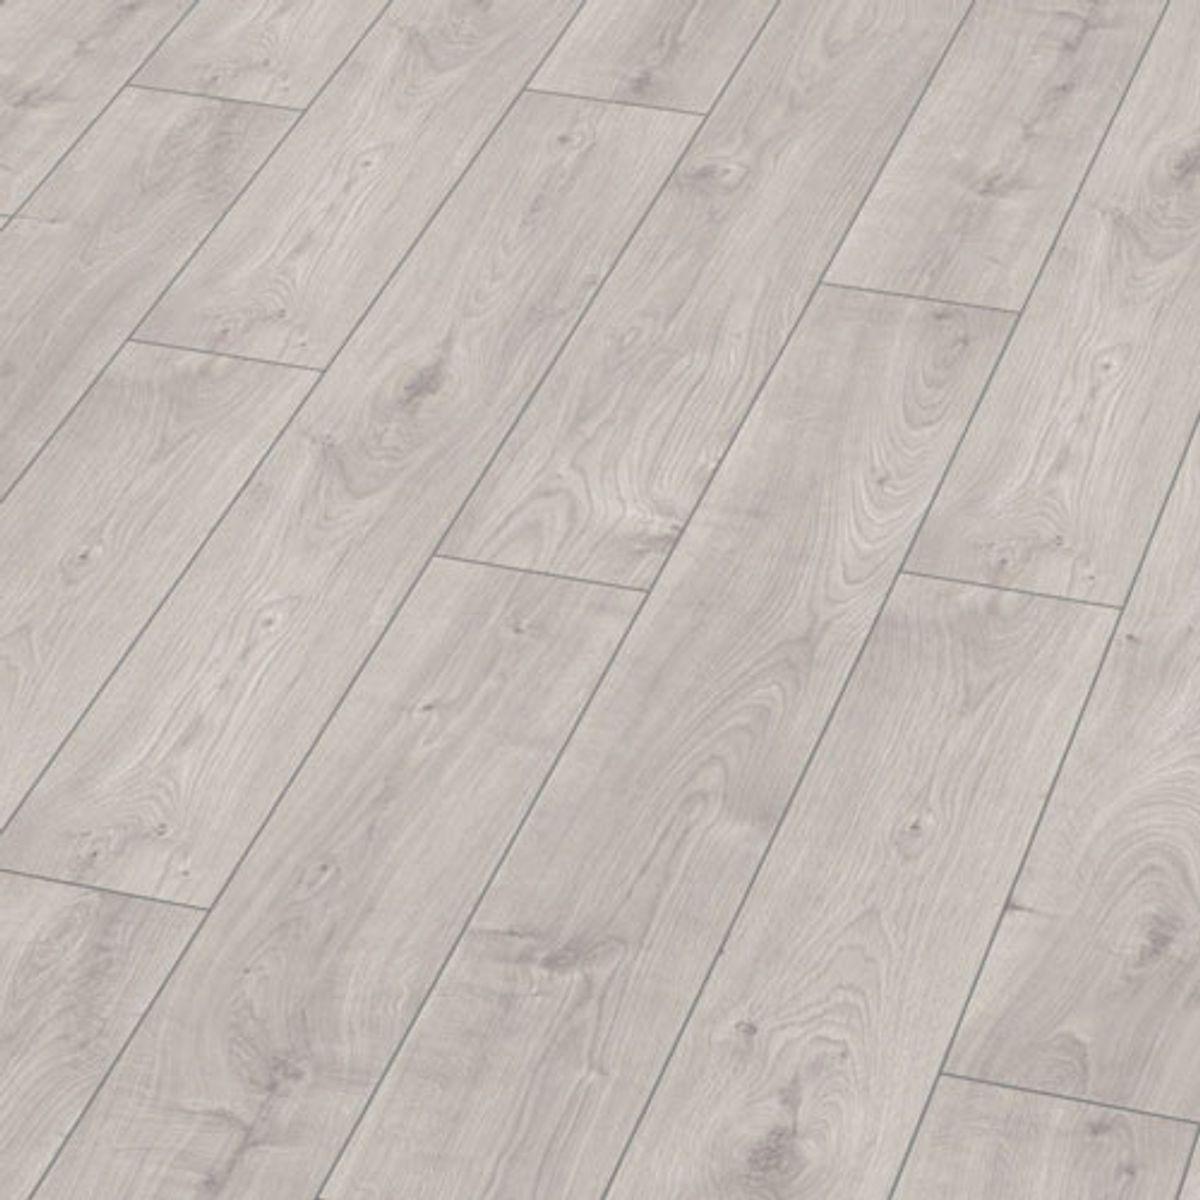 Stratifié Vermont exquisit chêne blanchi 193x1380mm